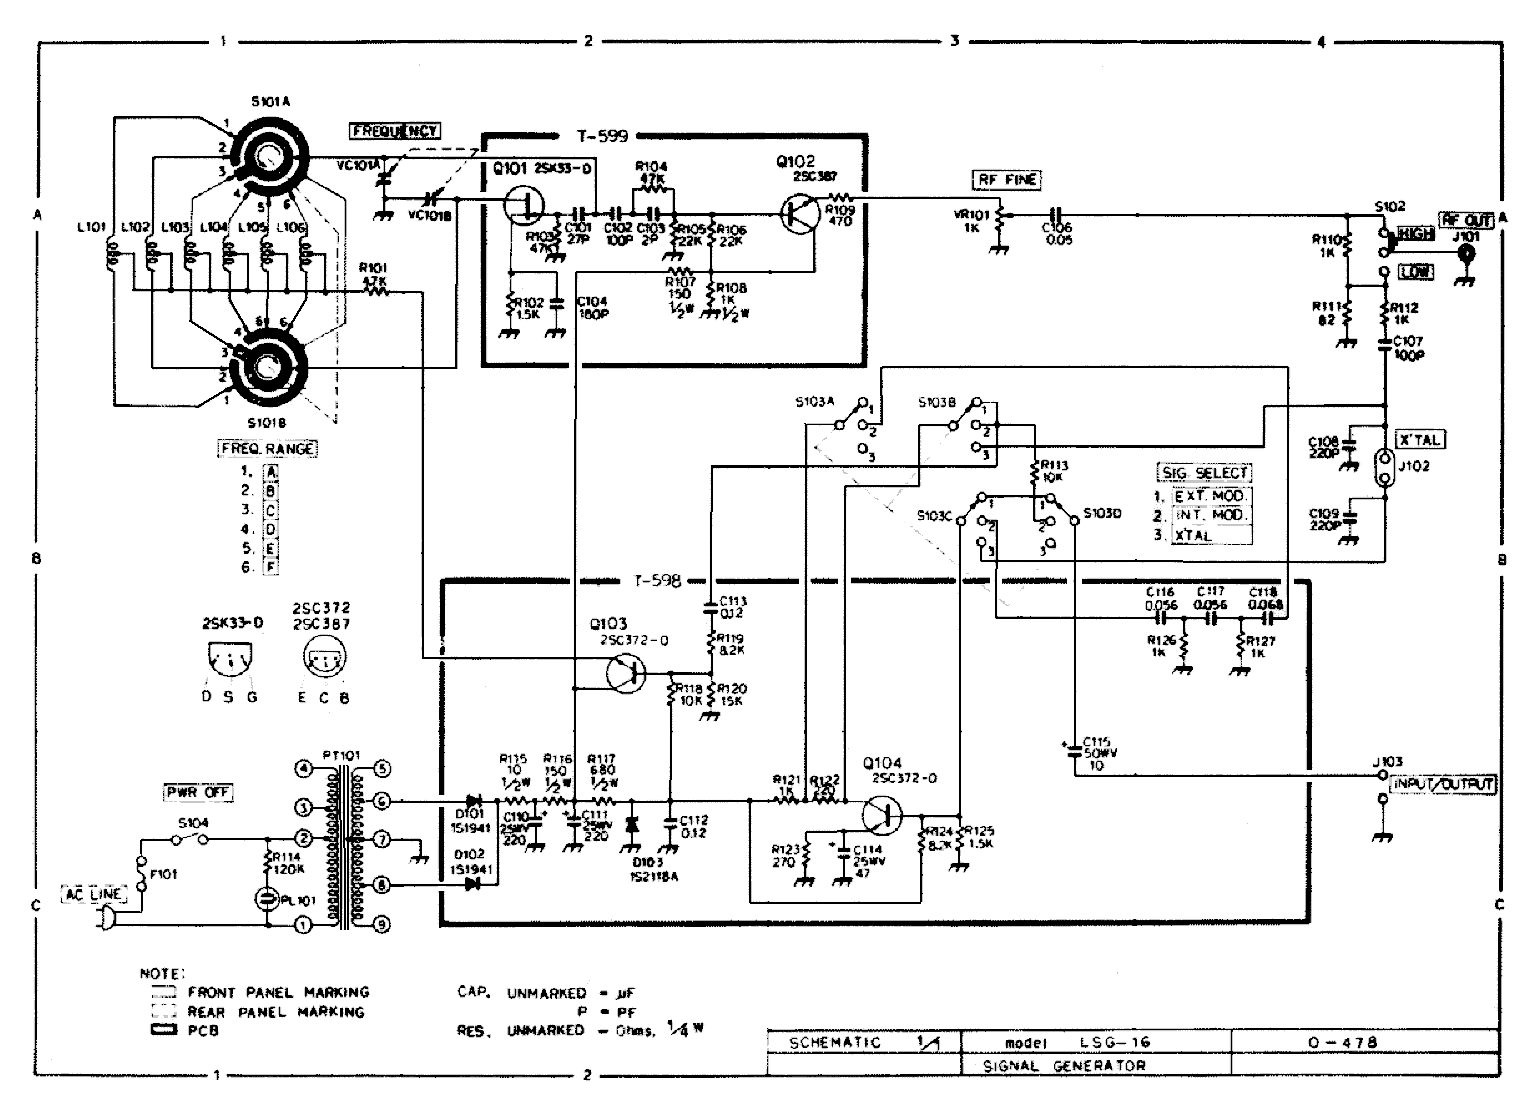 Leader Lsg17 Repair In The Workshop Vrat Stripboard Relay Shield Circuit Diagram Click For A Bigger Image Thanks Mike